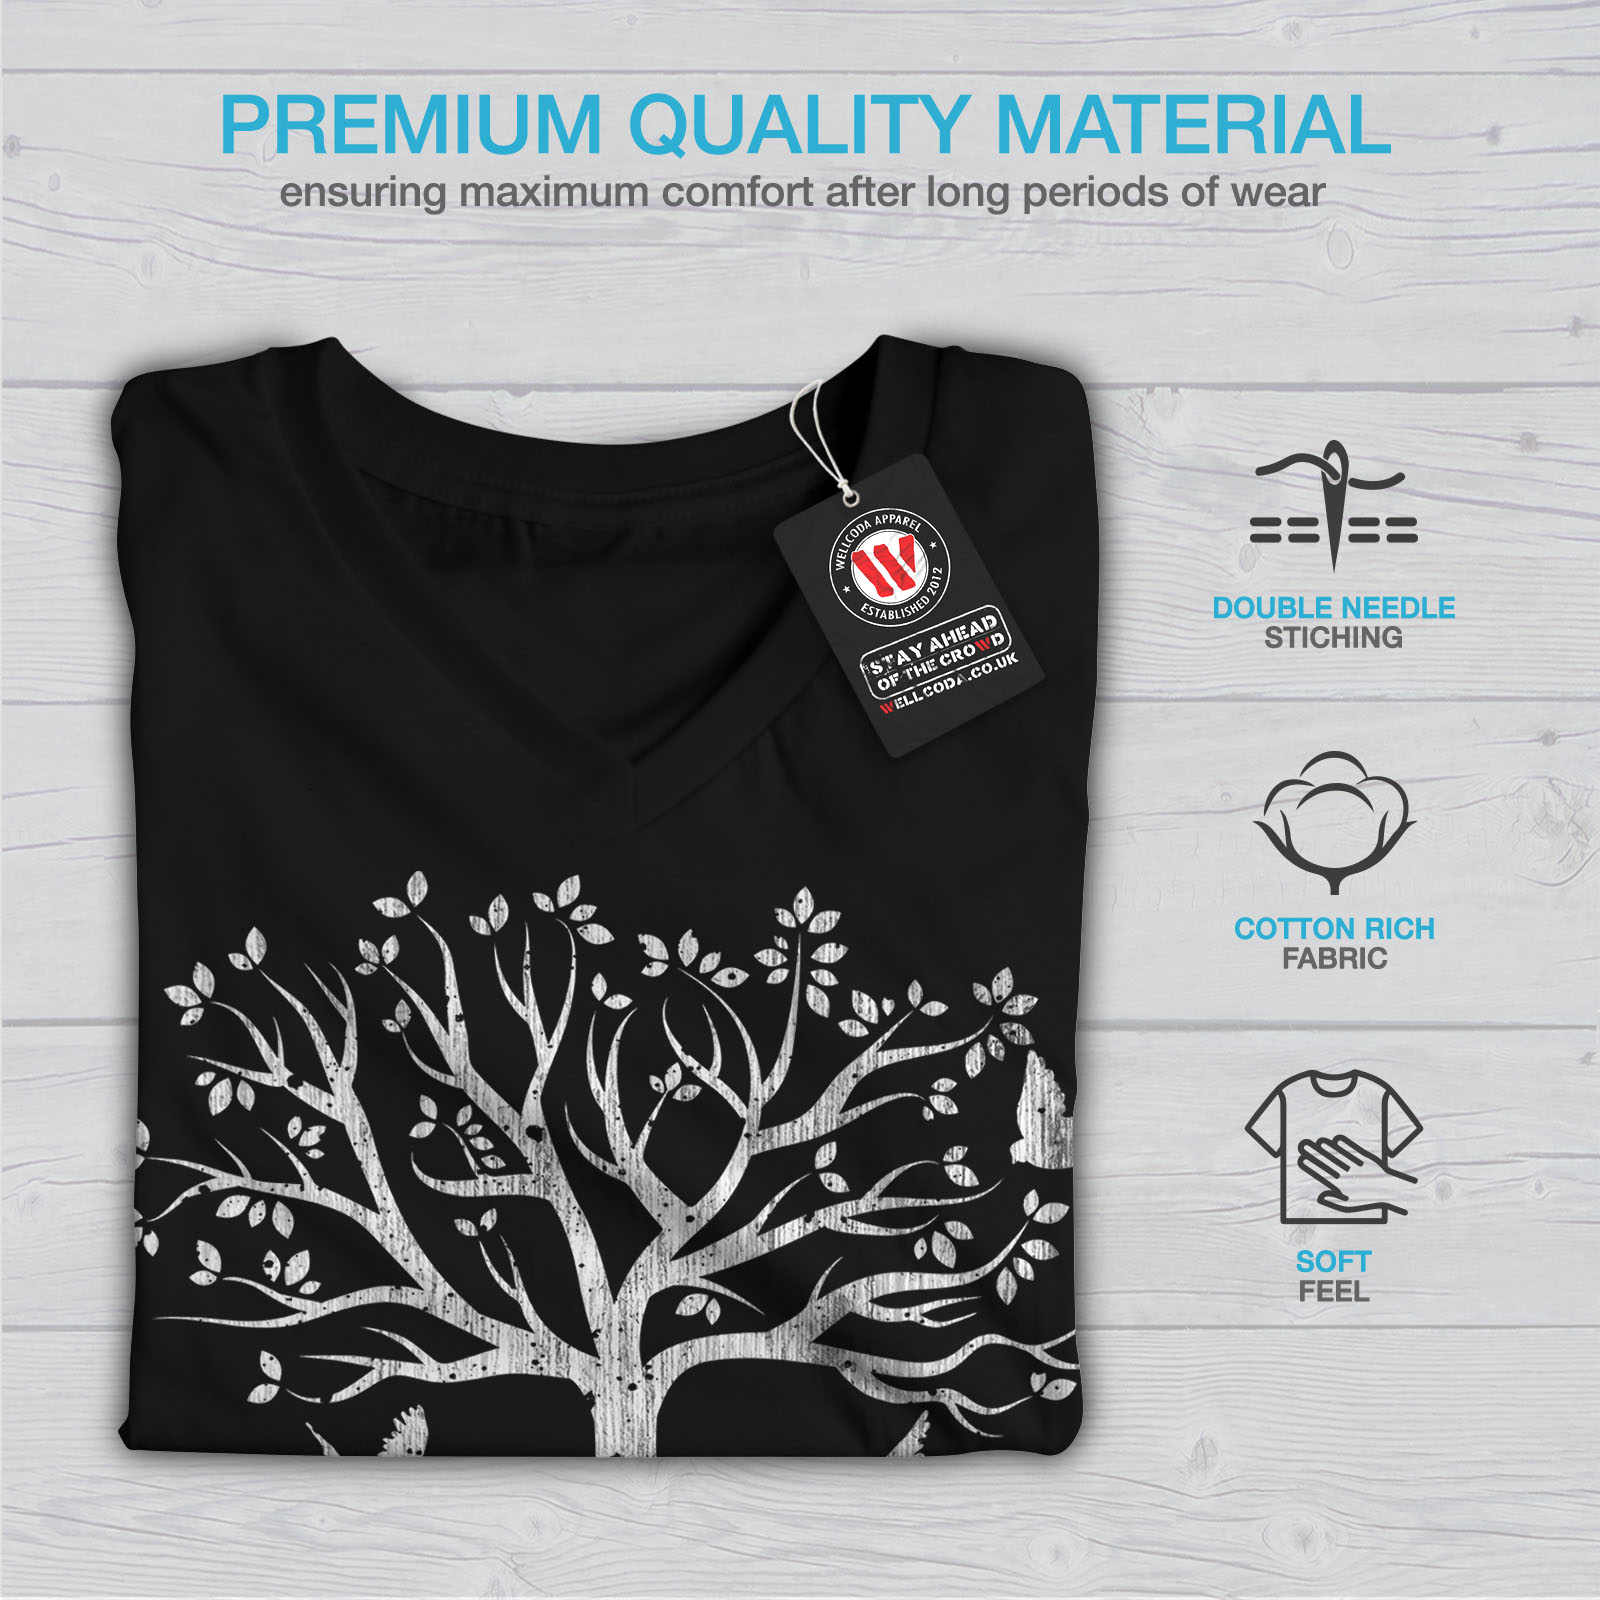 Wellcoda-Guitar-Music-Tree-Womens-V-Neck-T-shirt-Life-Graphic-Design-Tee thumbnail 5